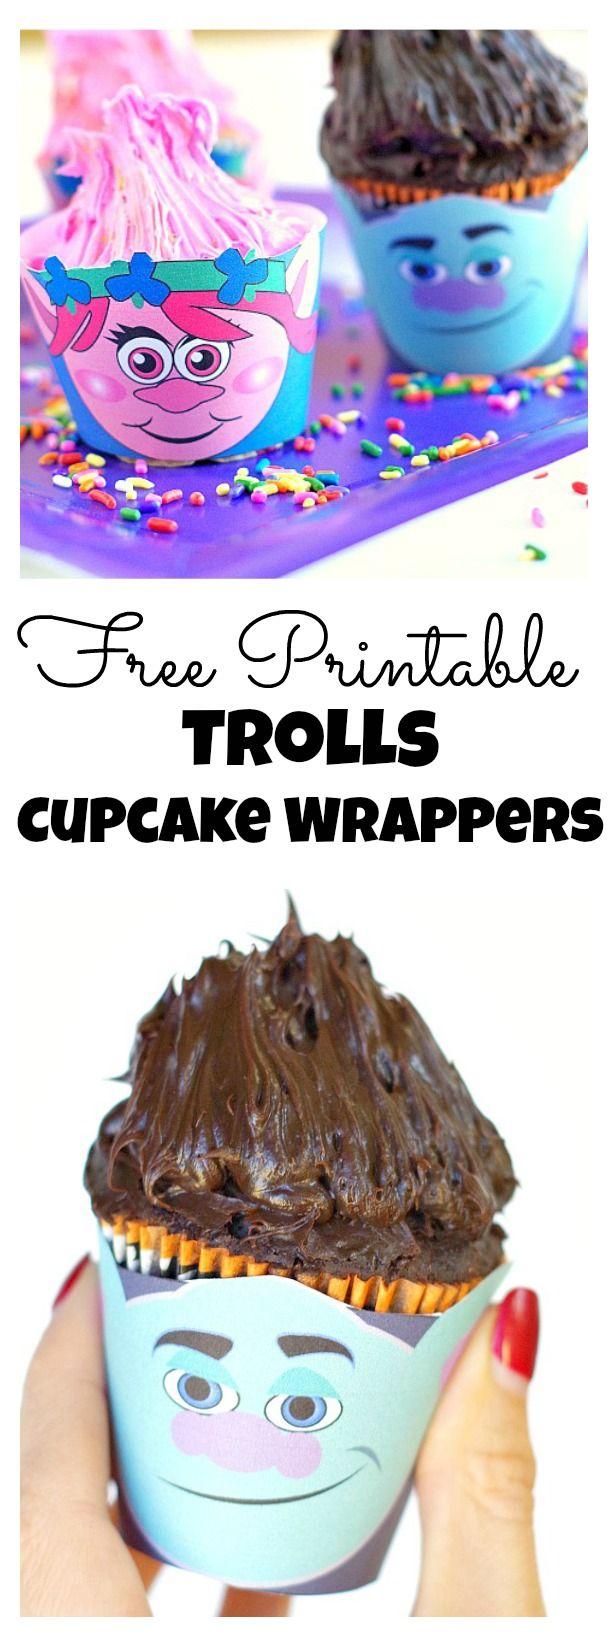 Free Printable Trolls Cupcake Wrappers